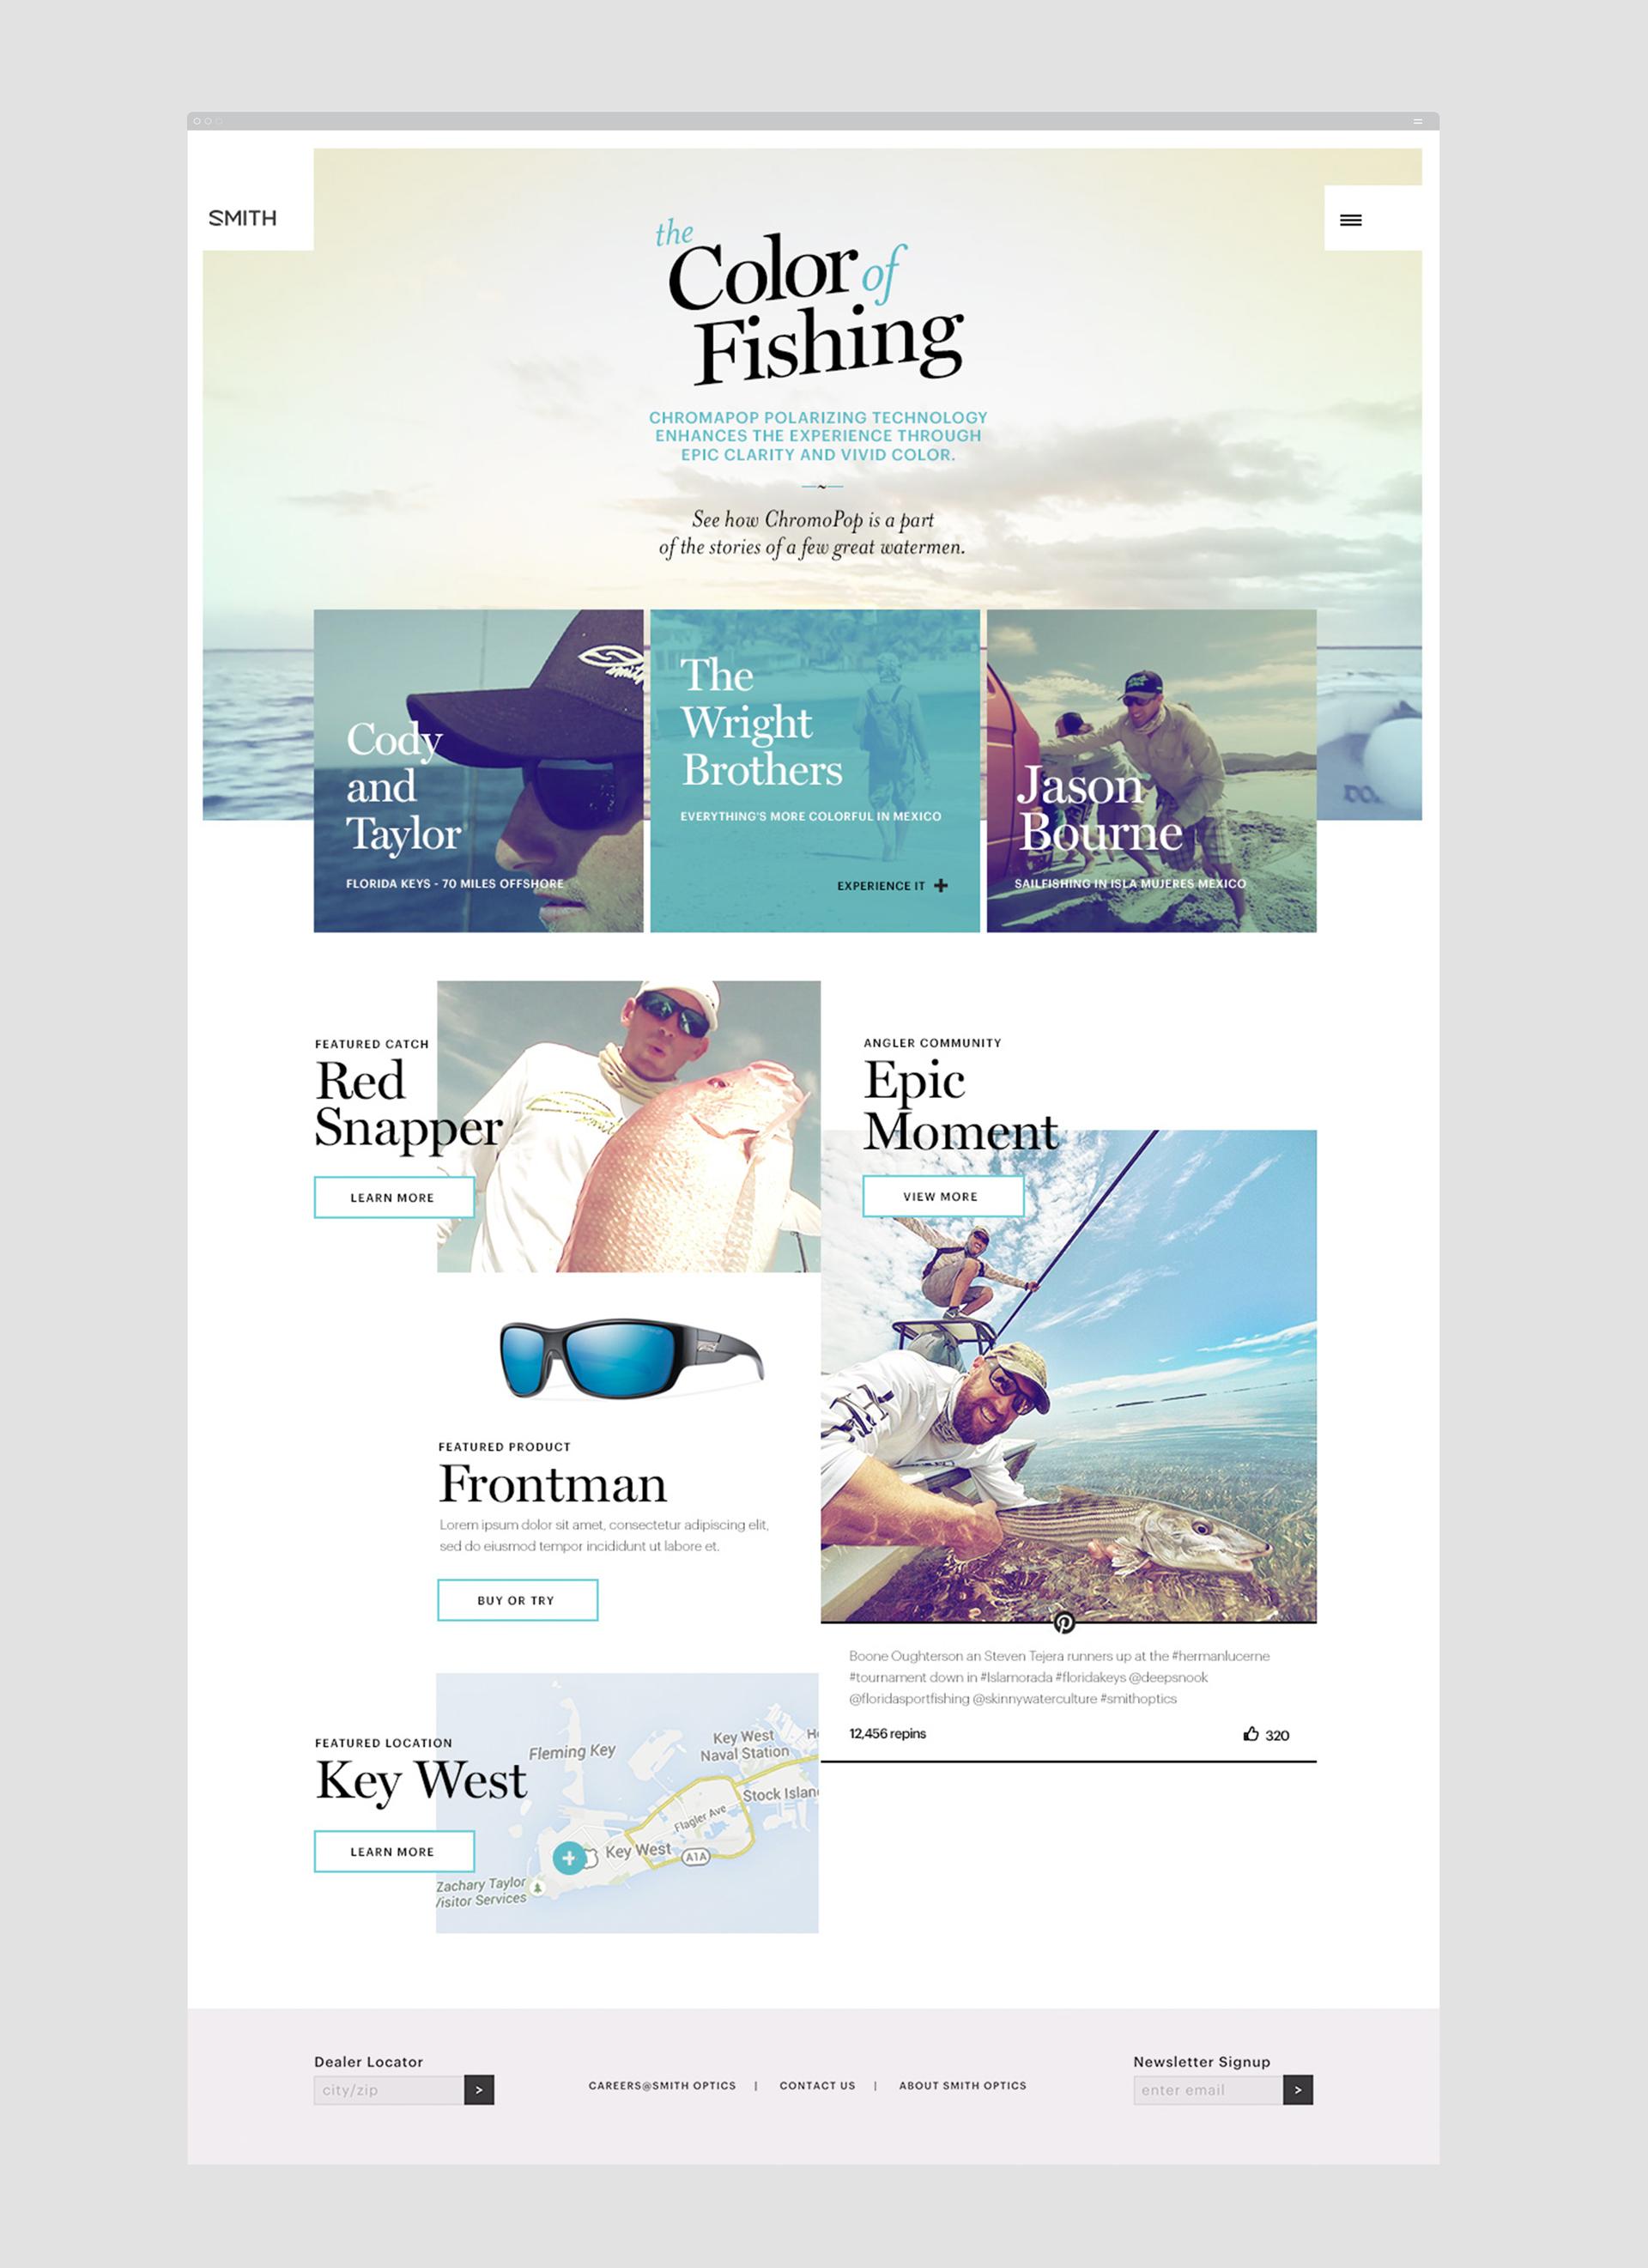 smith-homepage.jpg